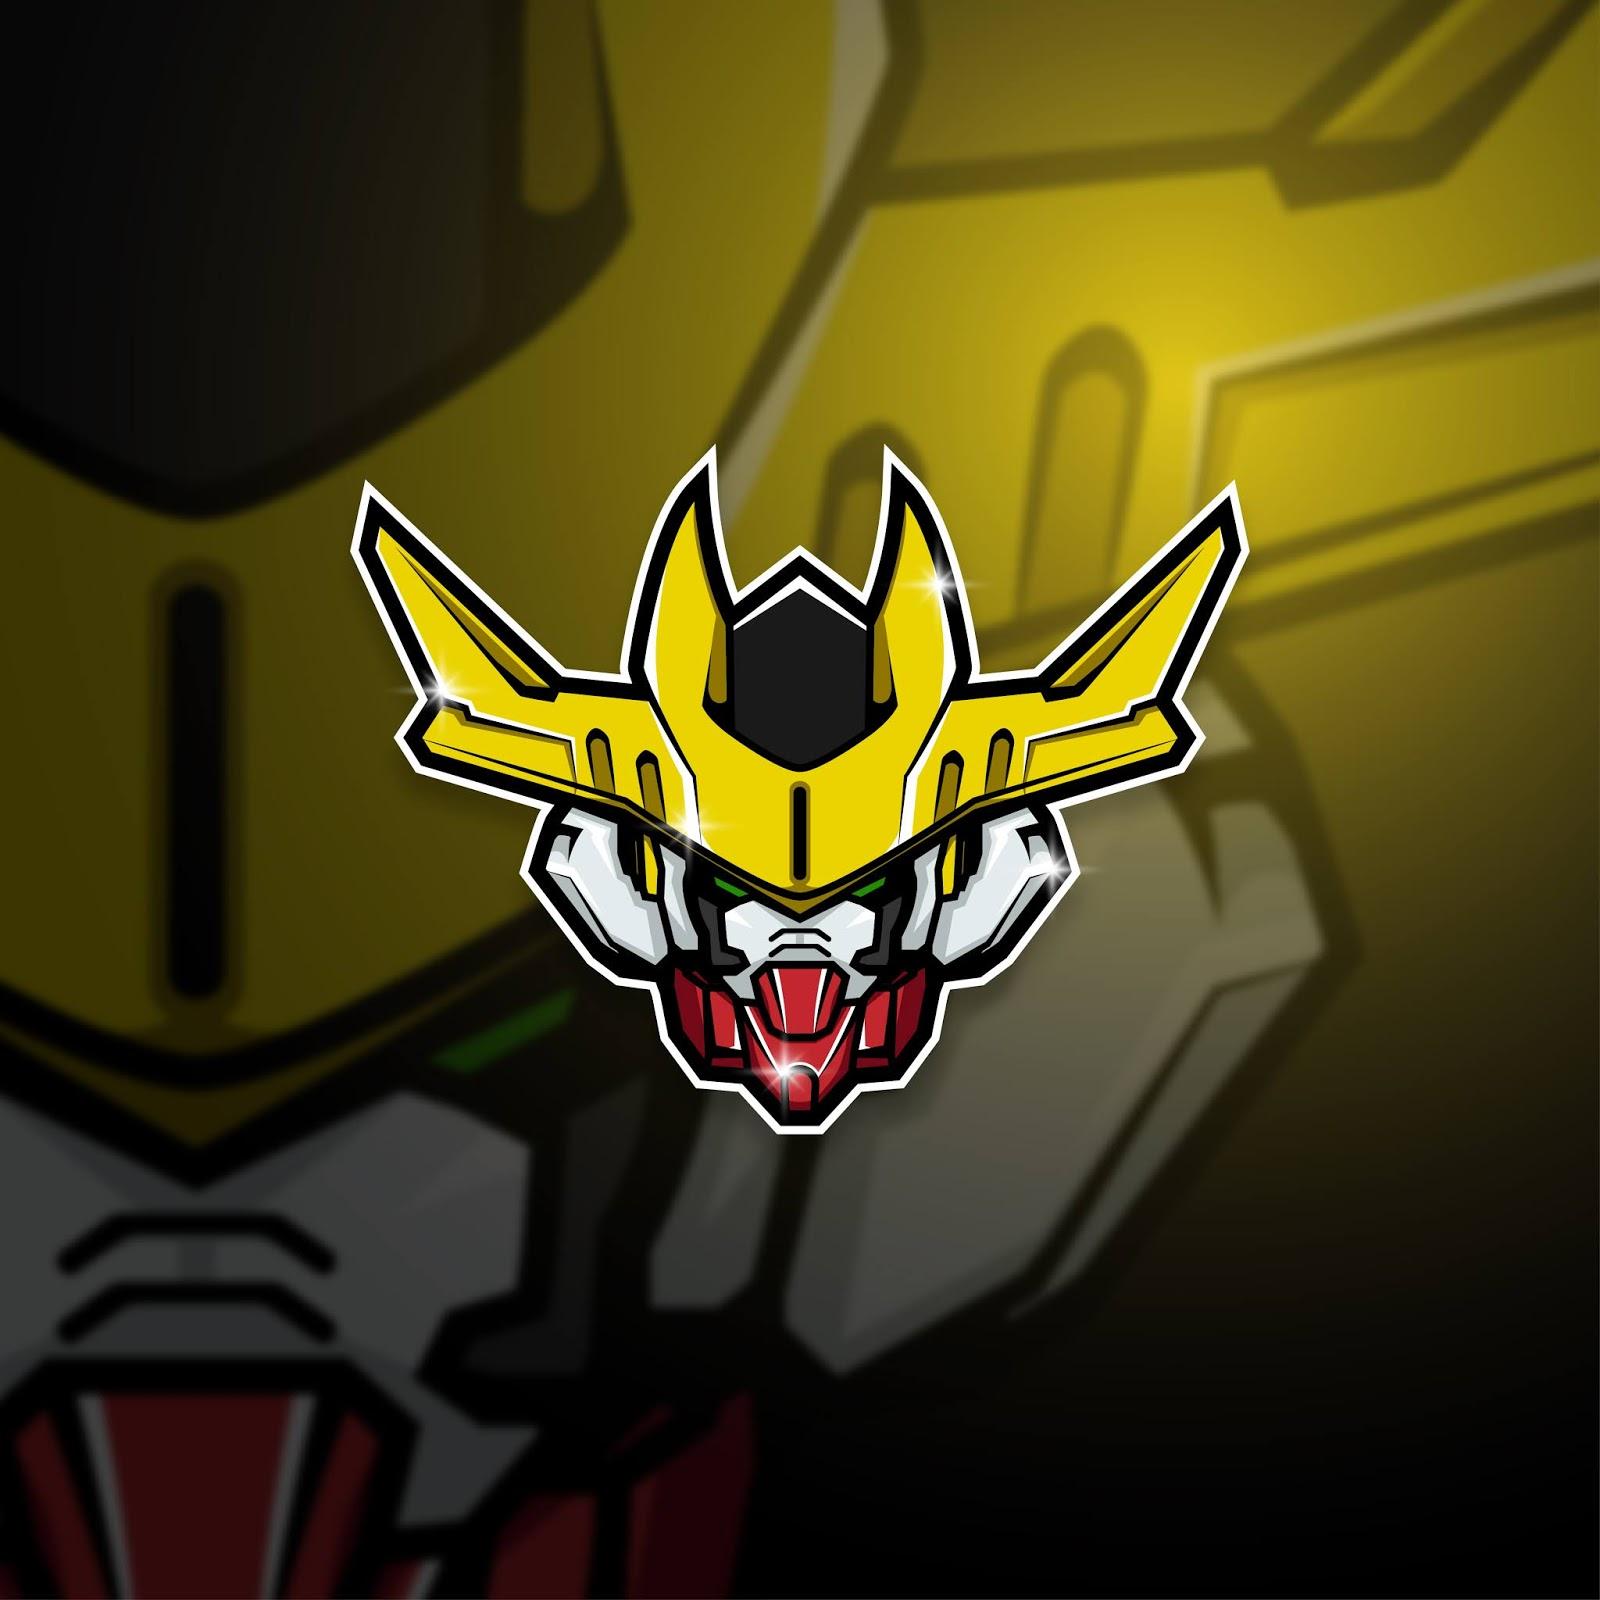 Esports Mascot Logo Team Barbatos Squad Free Download Vector CDR, AI, EPS and PNG Formats